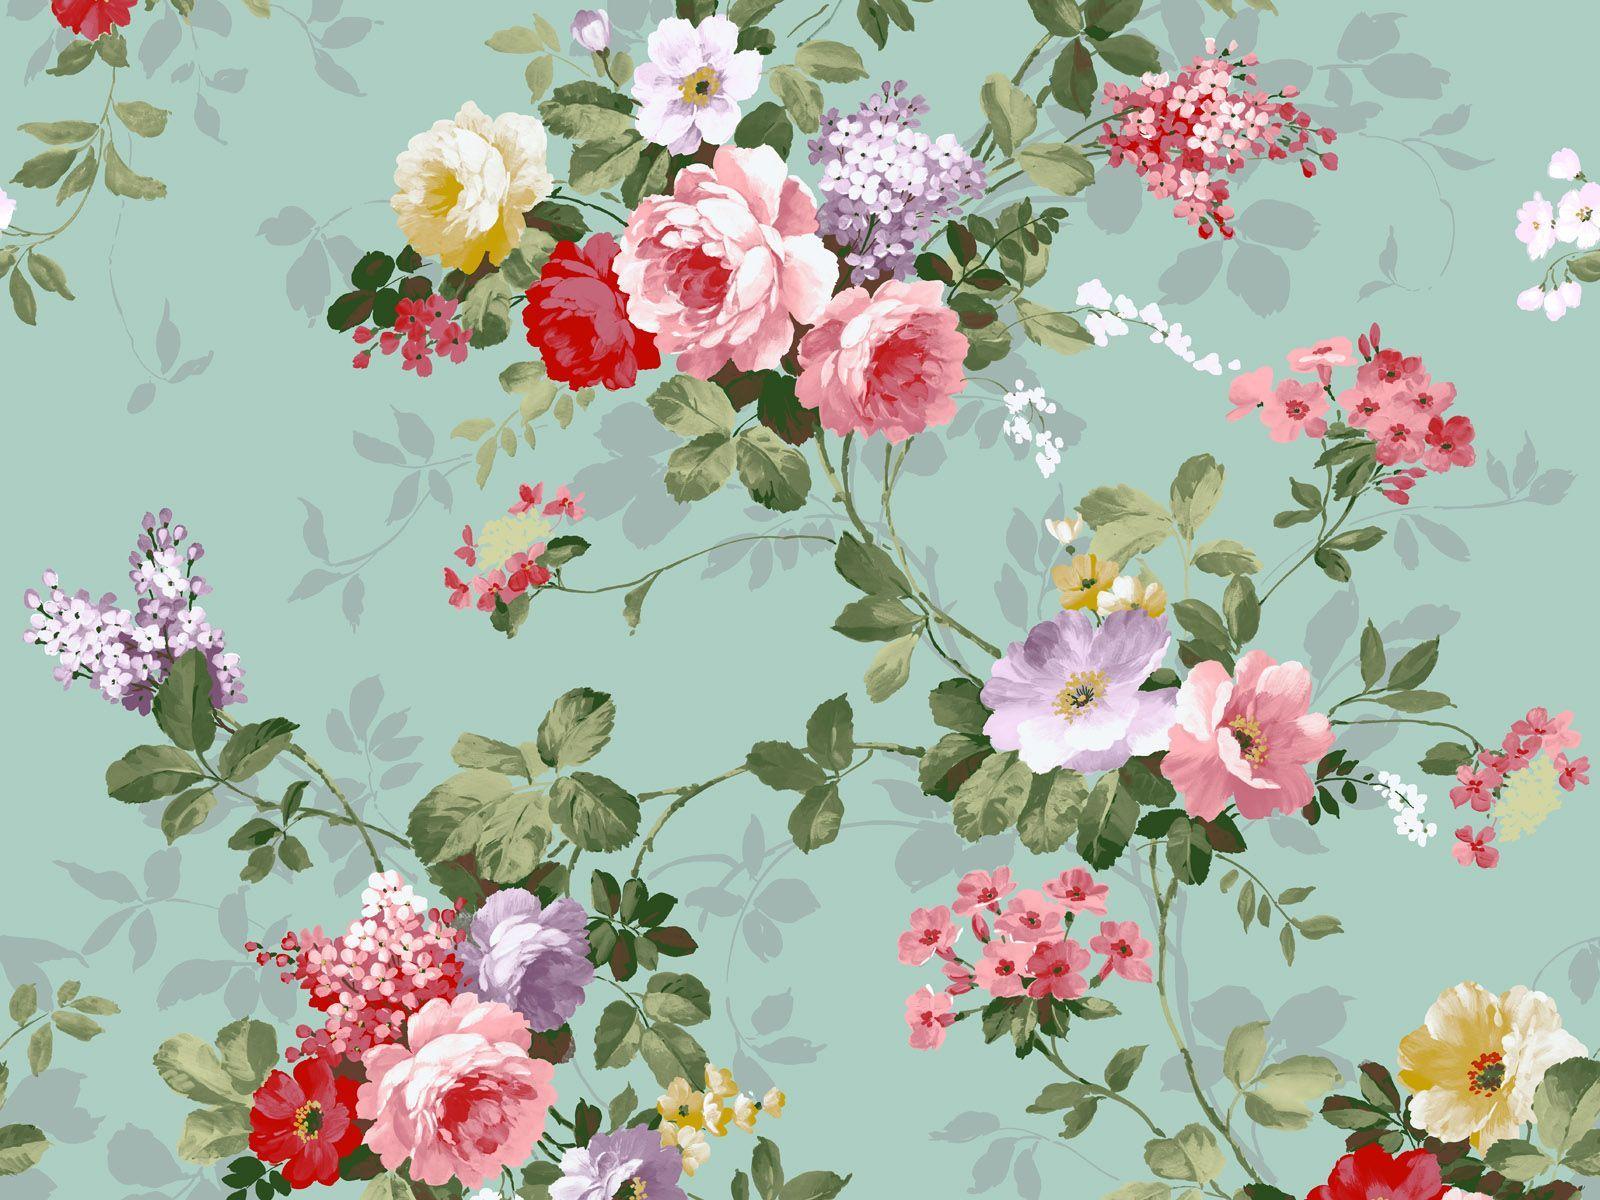 Floral Computer Wallpaper Sf Wallpaper